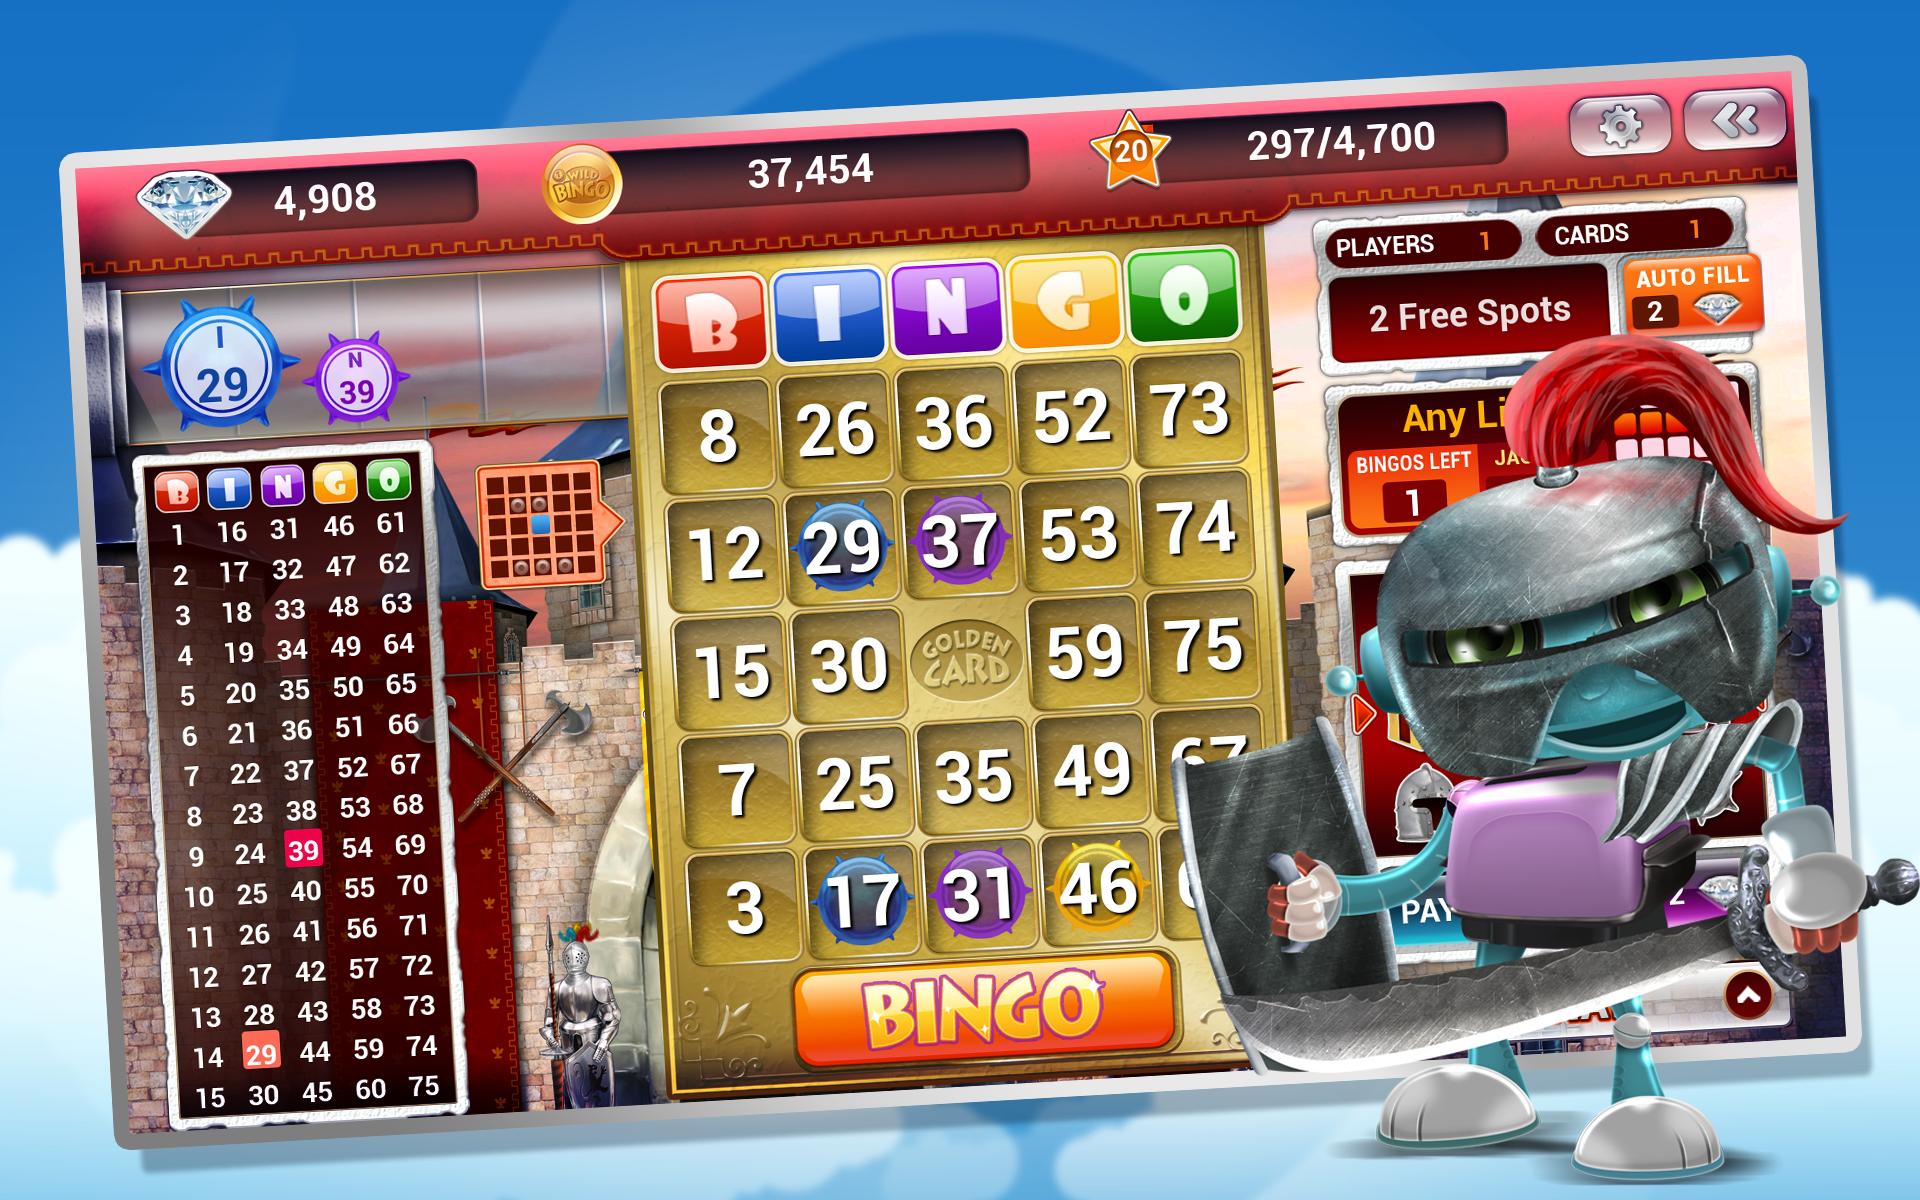 Wild Bingo Dragon Play